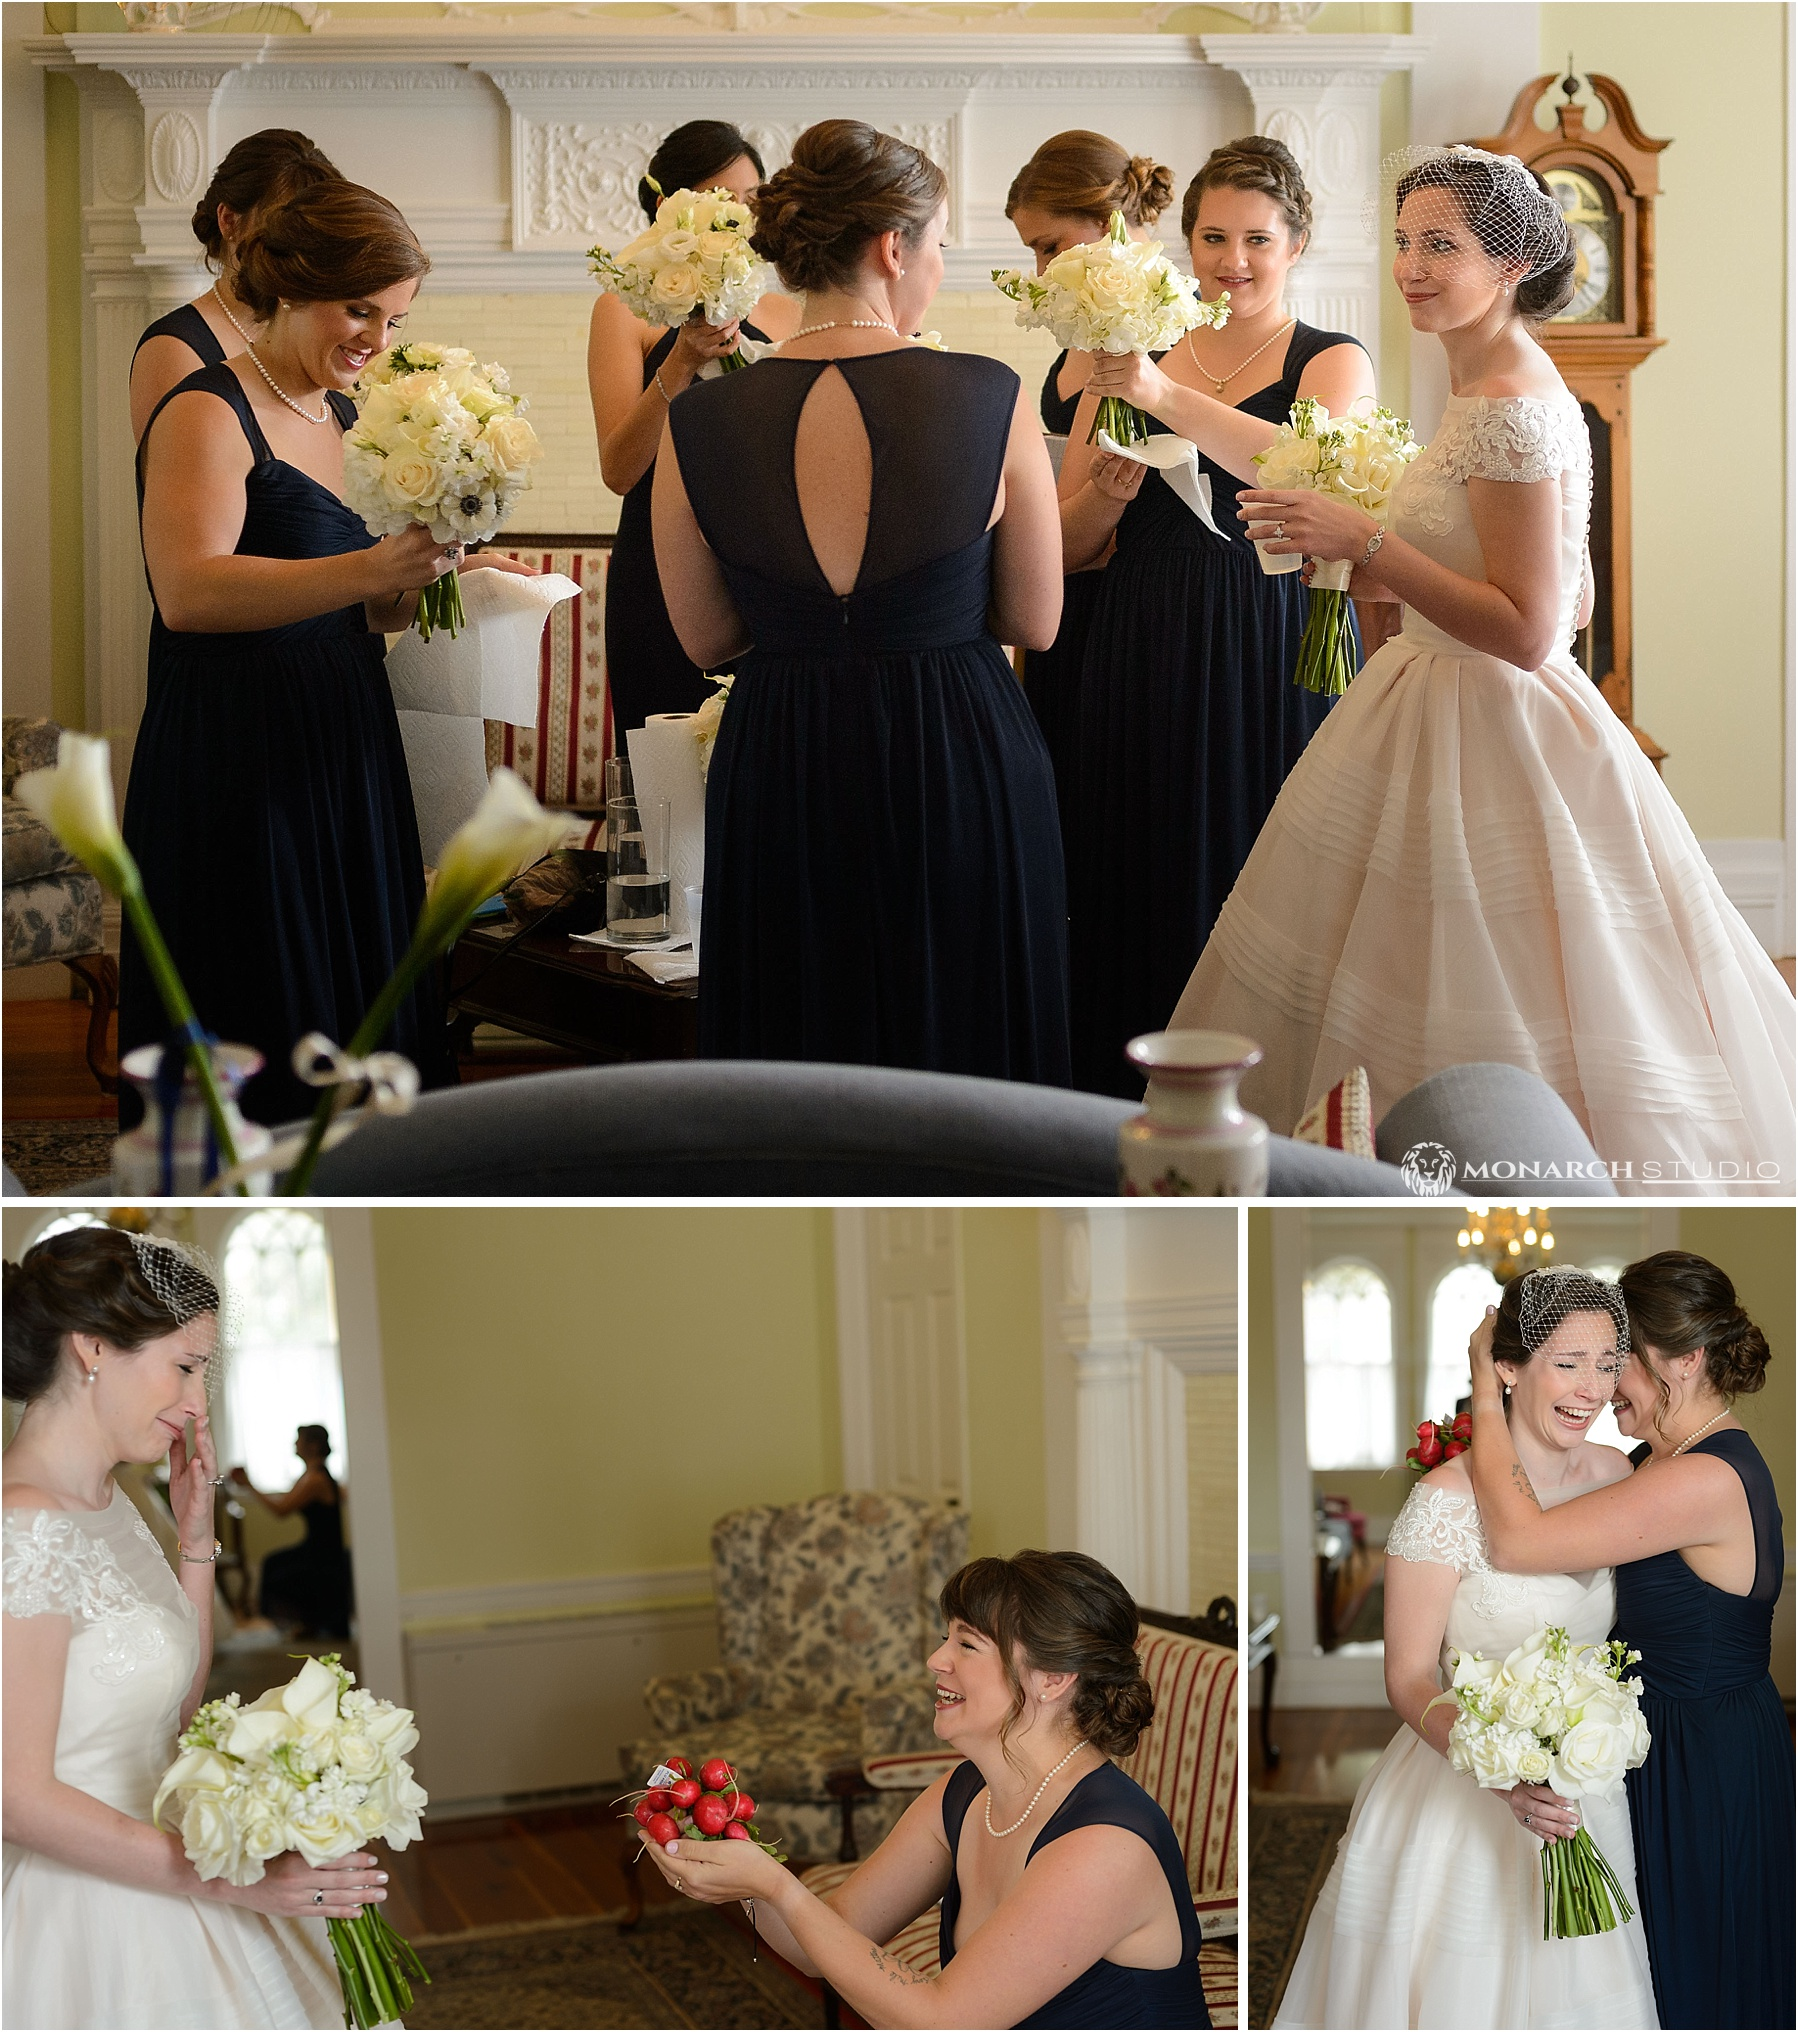 020-st-augustine-wedding-photographer-.jpg